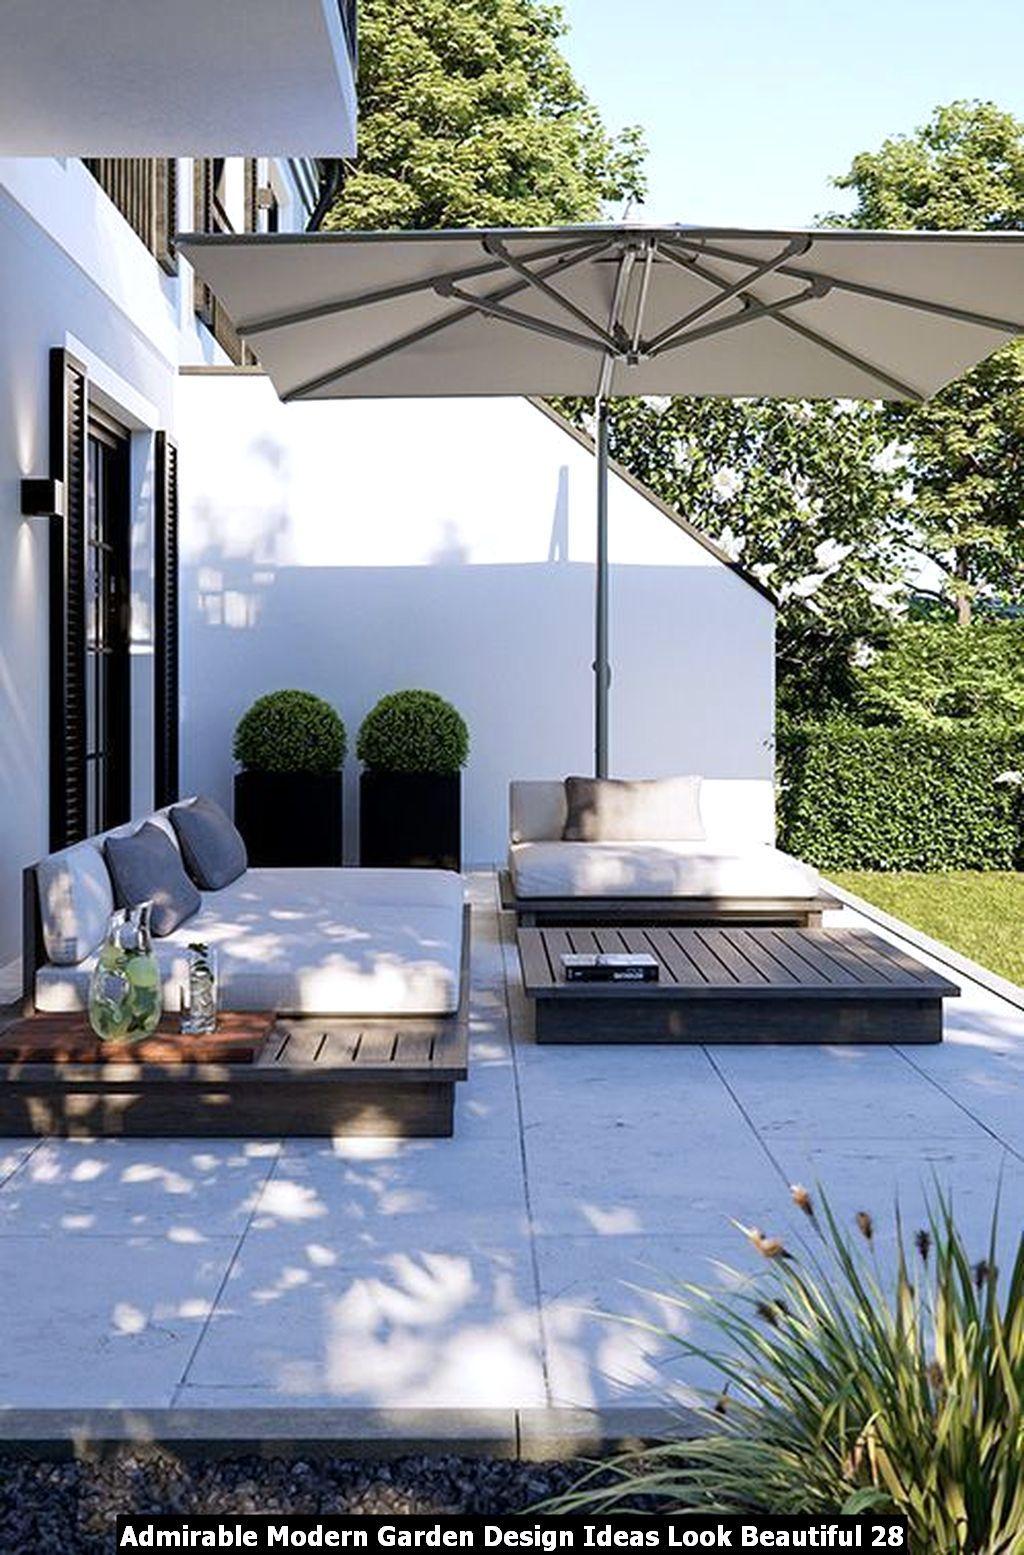 Admirable Modern Garden Design Ideas Look Beautiful Pimphomee Backyard Patio Designs Patio Design Outdoor Gardens Design